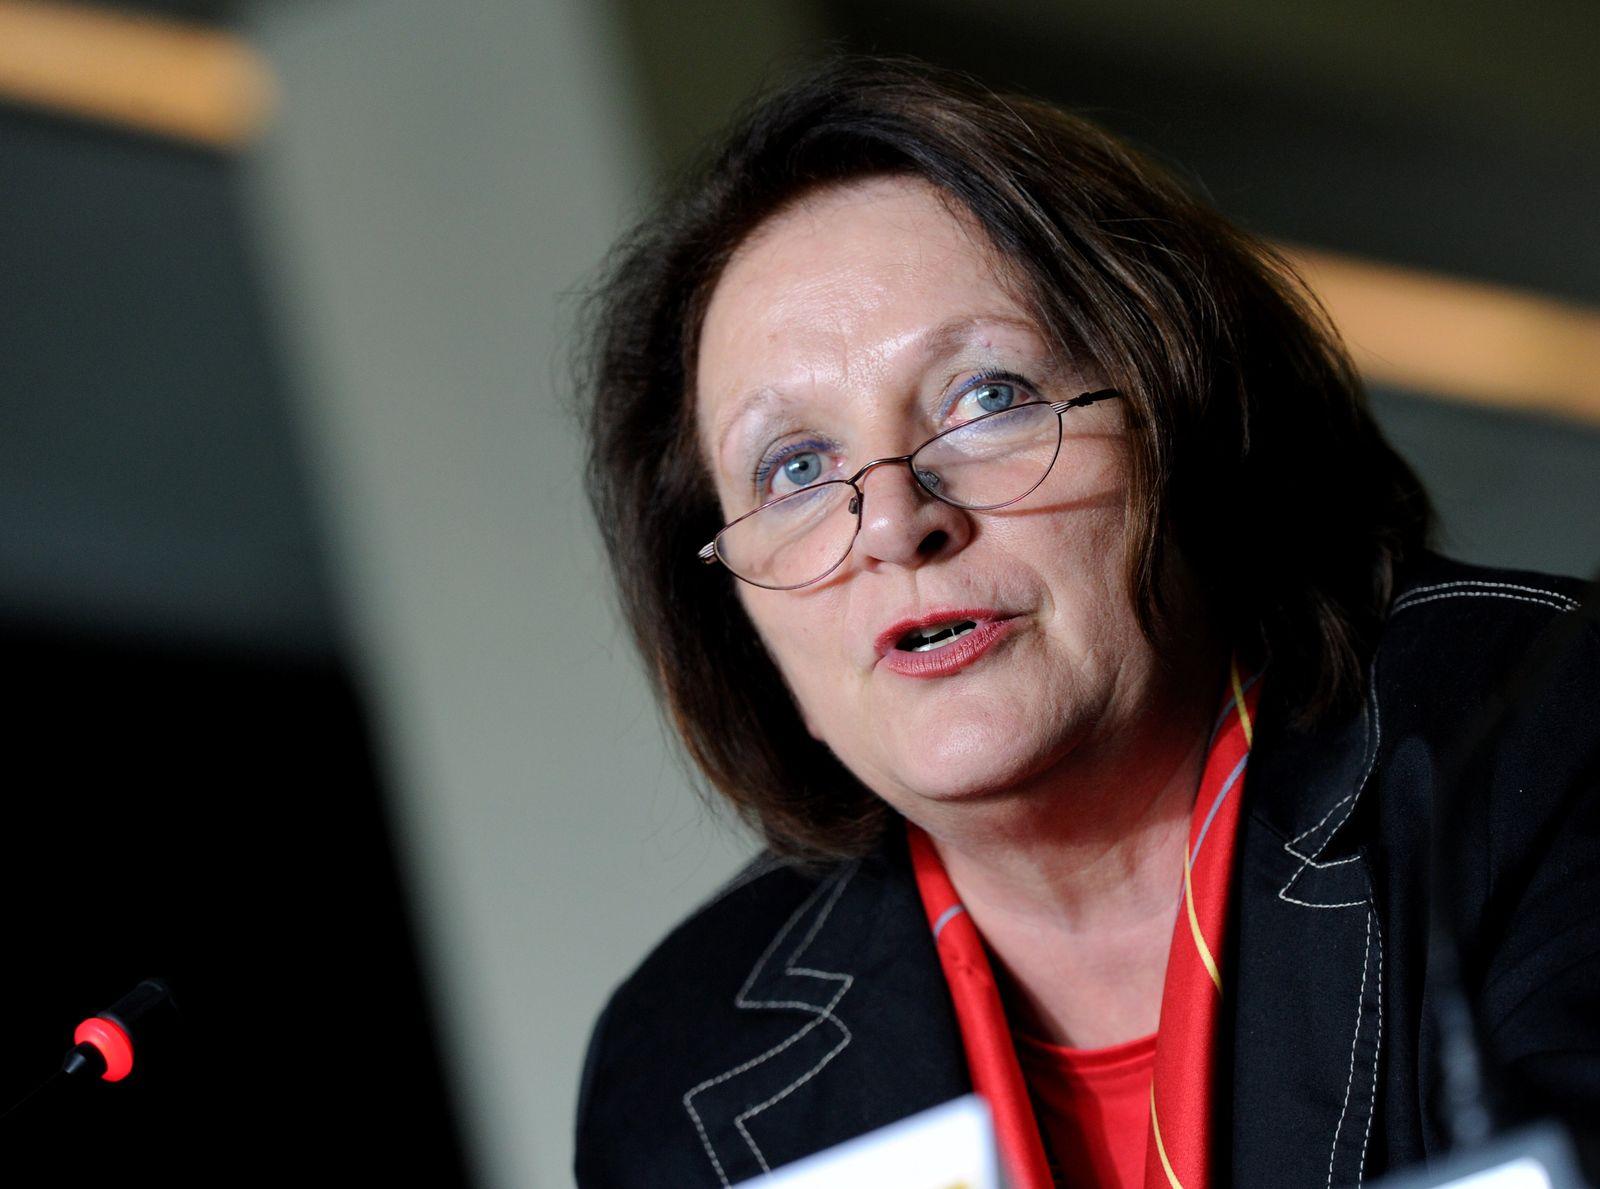 Sabine Leutheusser-Schnarrenberger / FDP / Justizministerin